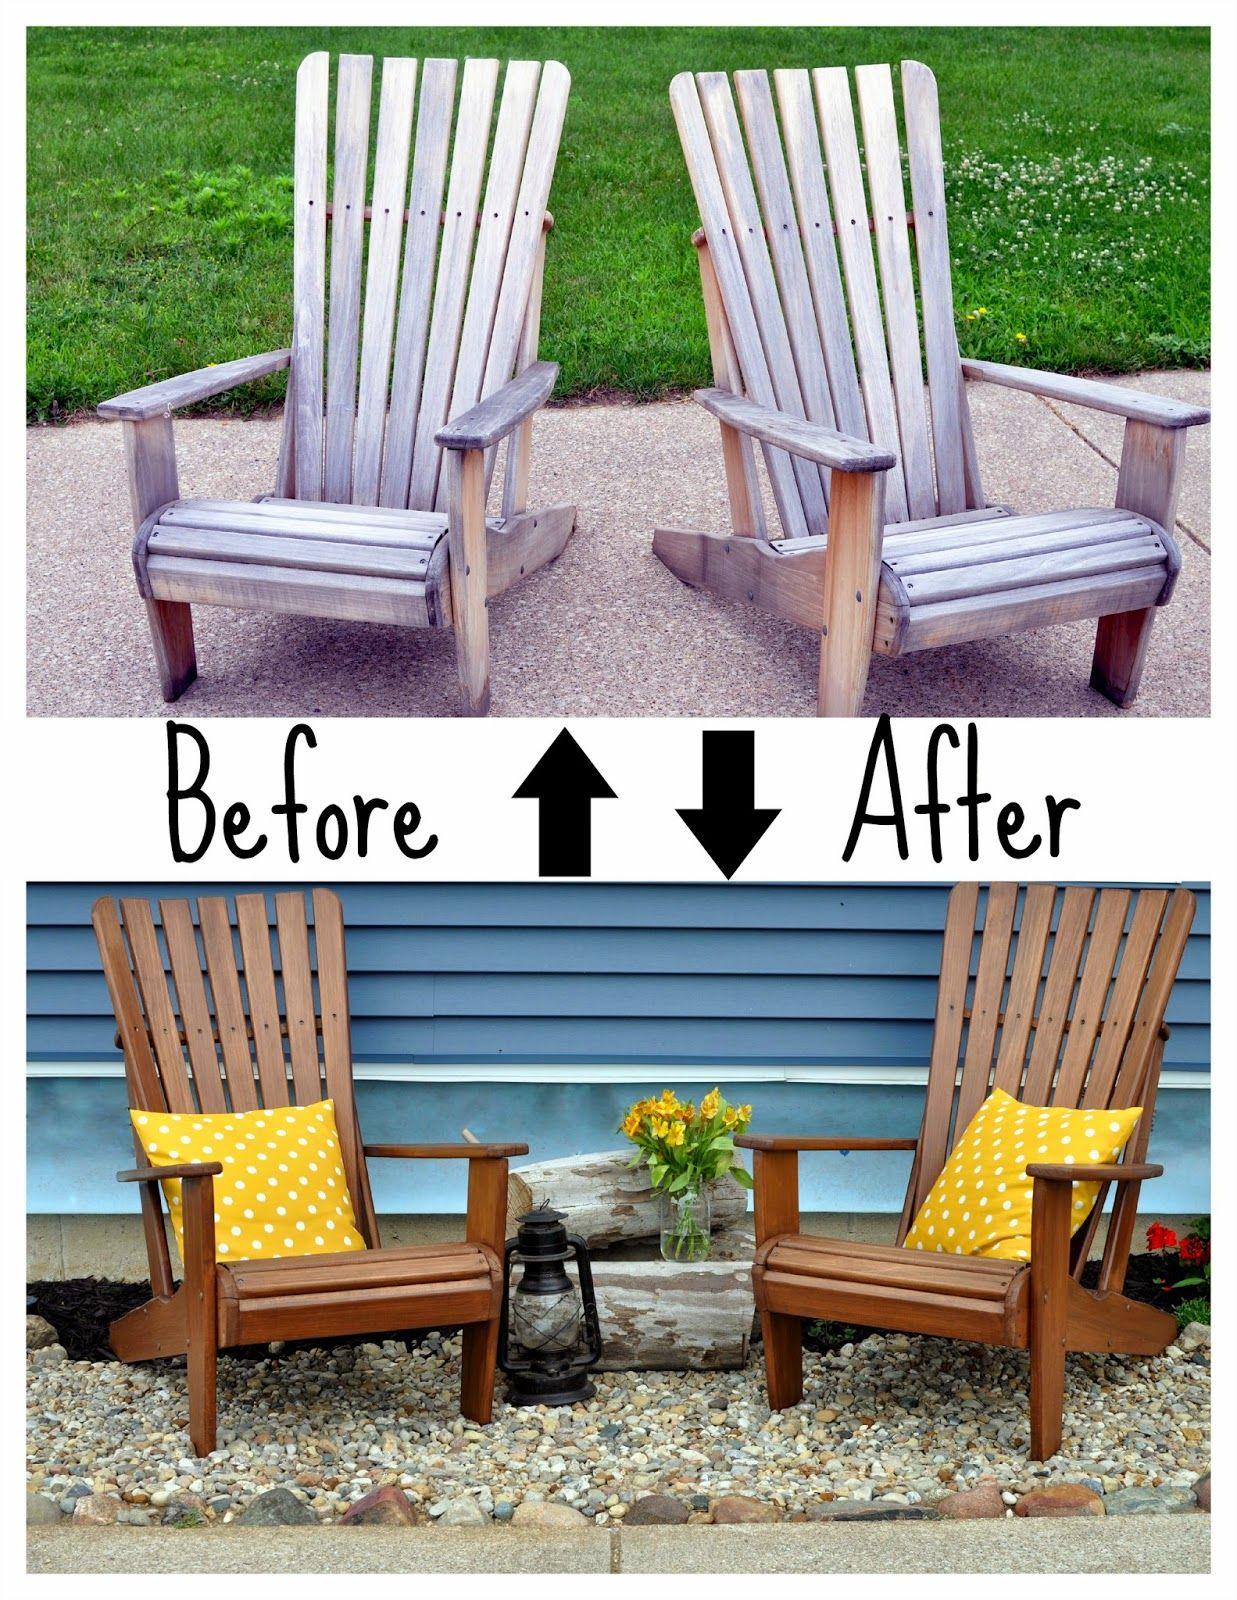 WeatherProofing the Adirondacks Outdoor wood furniture